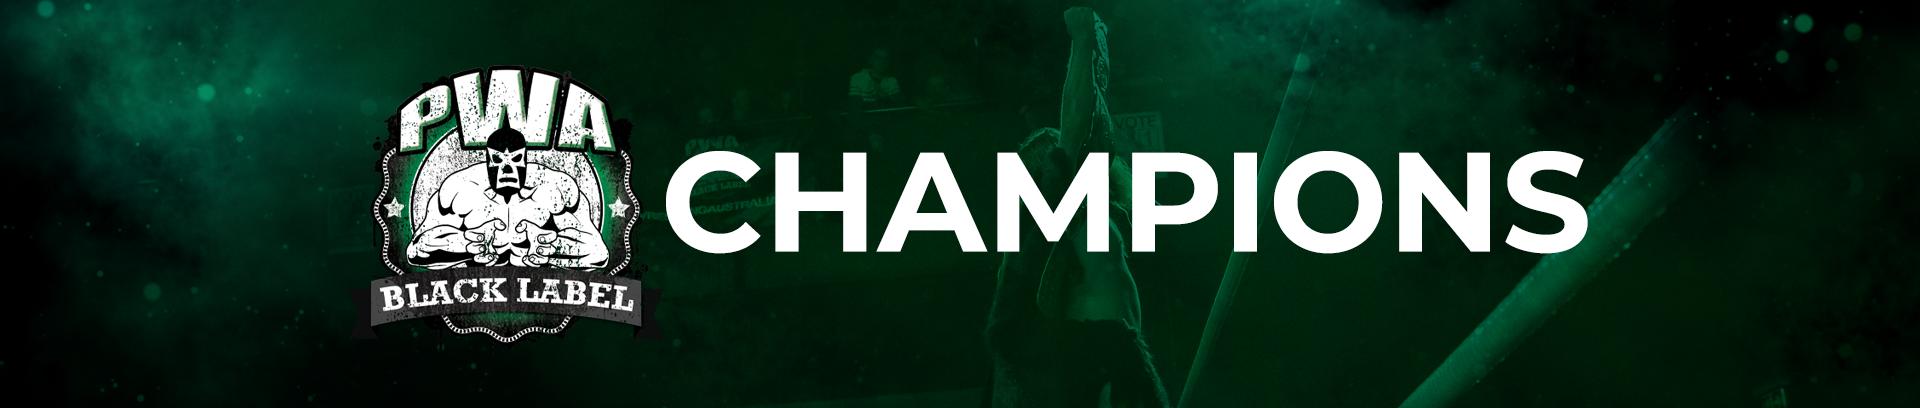 PWA Champions Banner.png